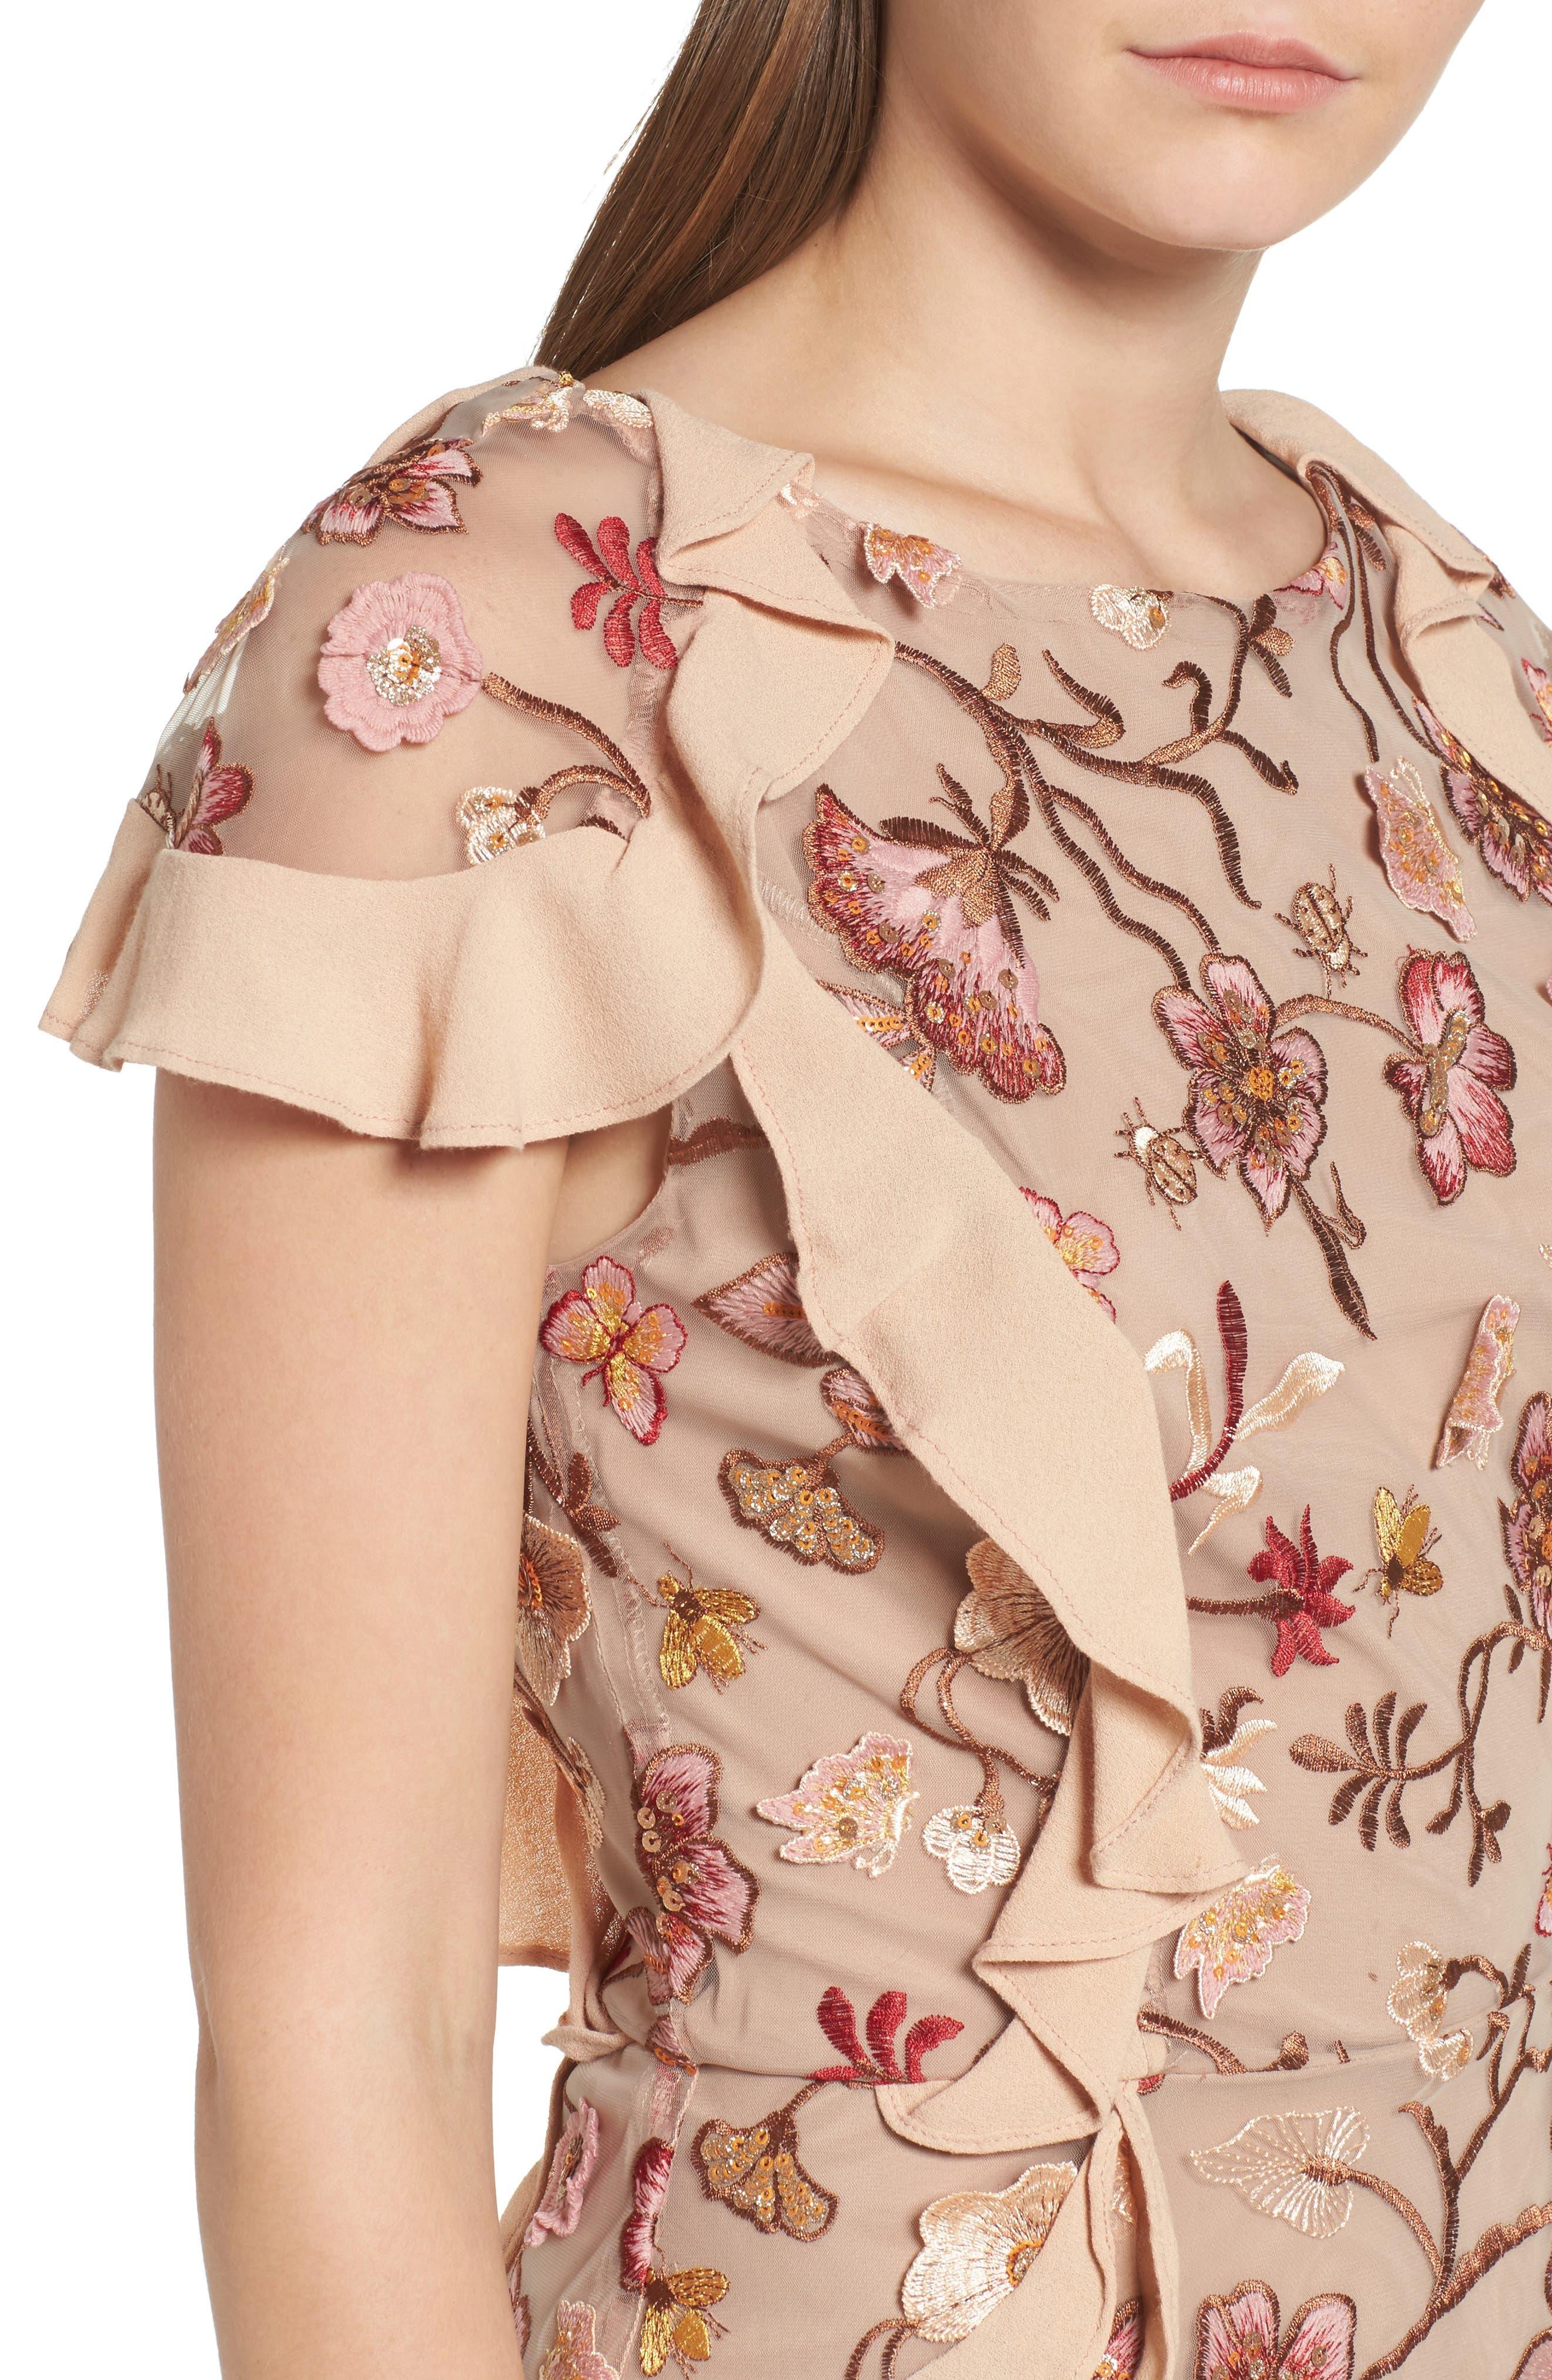 Botanical Embroidered Ruffle Minidress,                             Alternate thumbnail 4, color,                             250